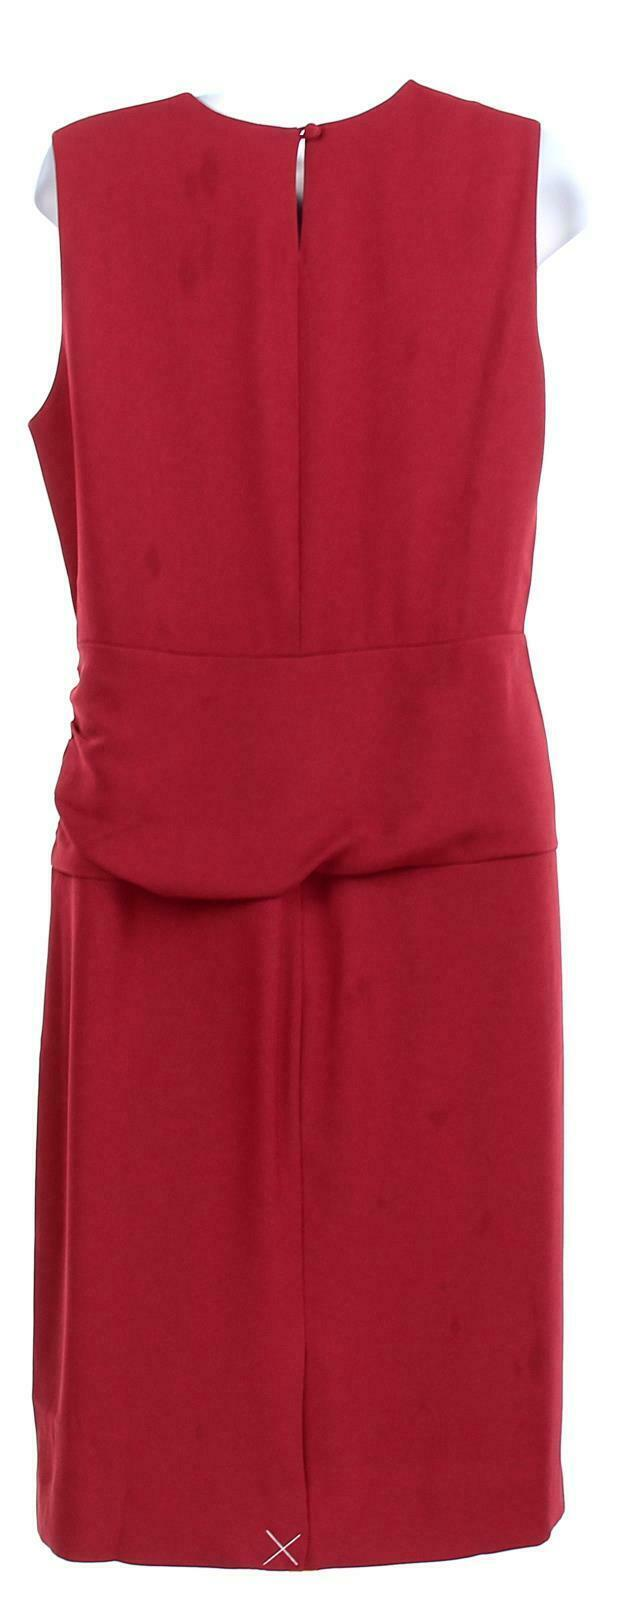 J Crew Women's High Neck Sheath Dress Everyday Lucky Crepe Wear to Work 8 J7452 image 4